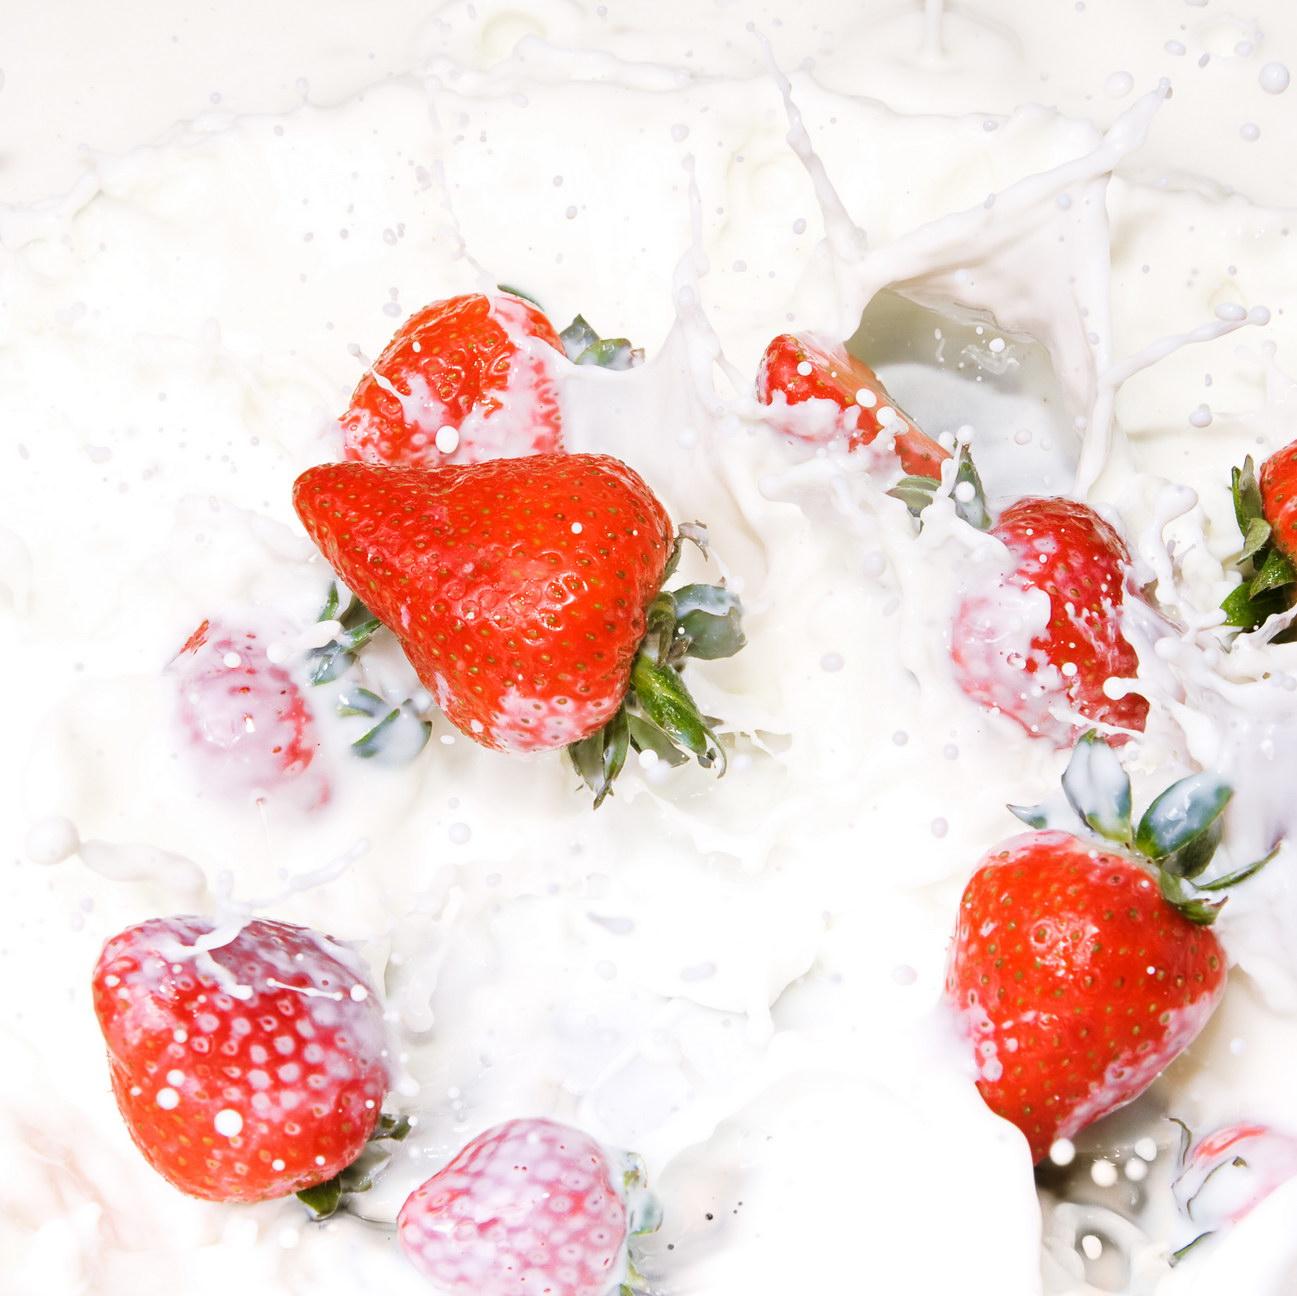 Strawberries in milk photo